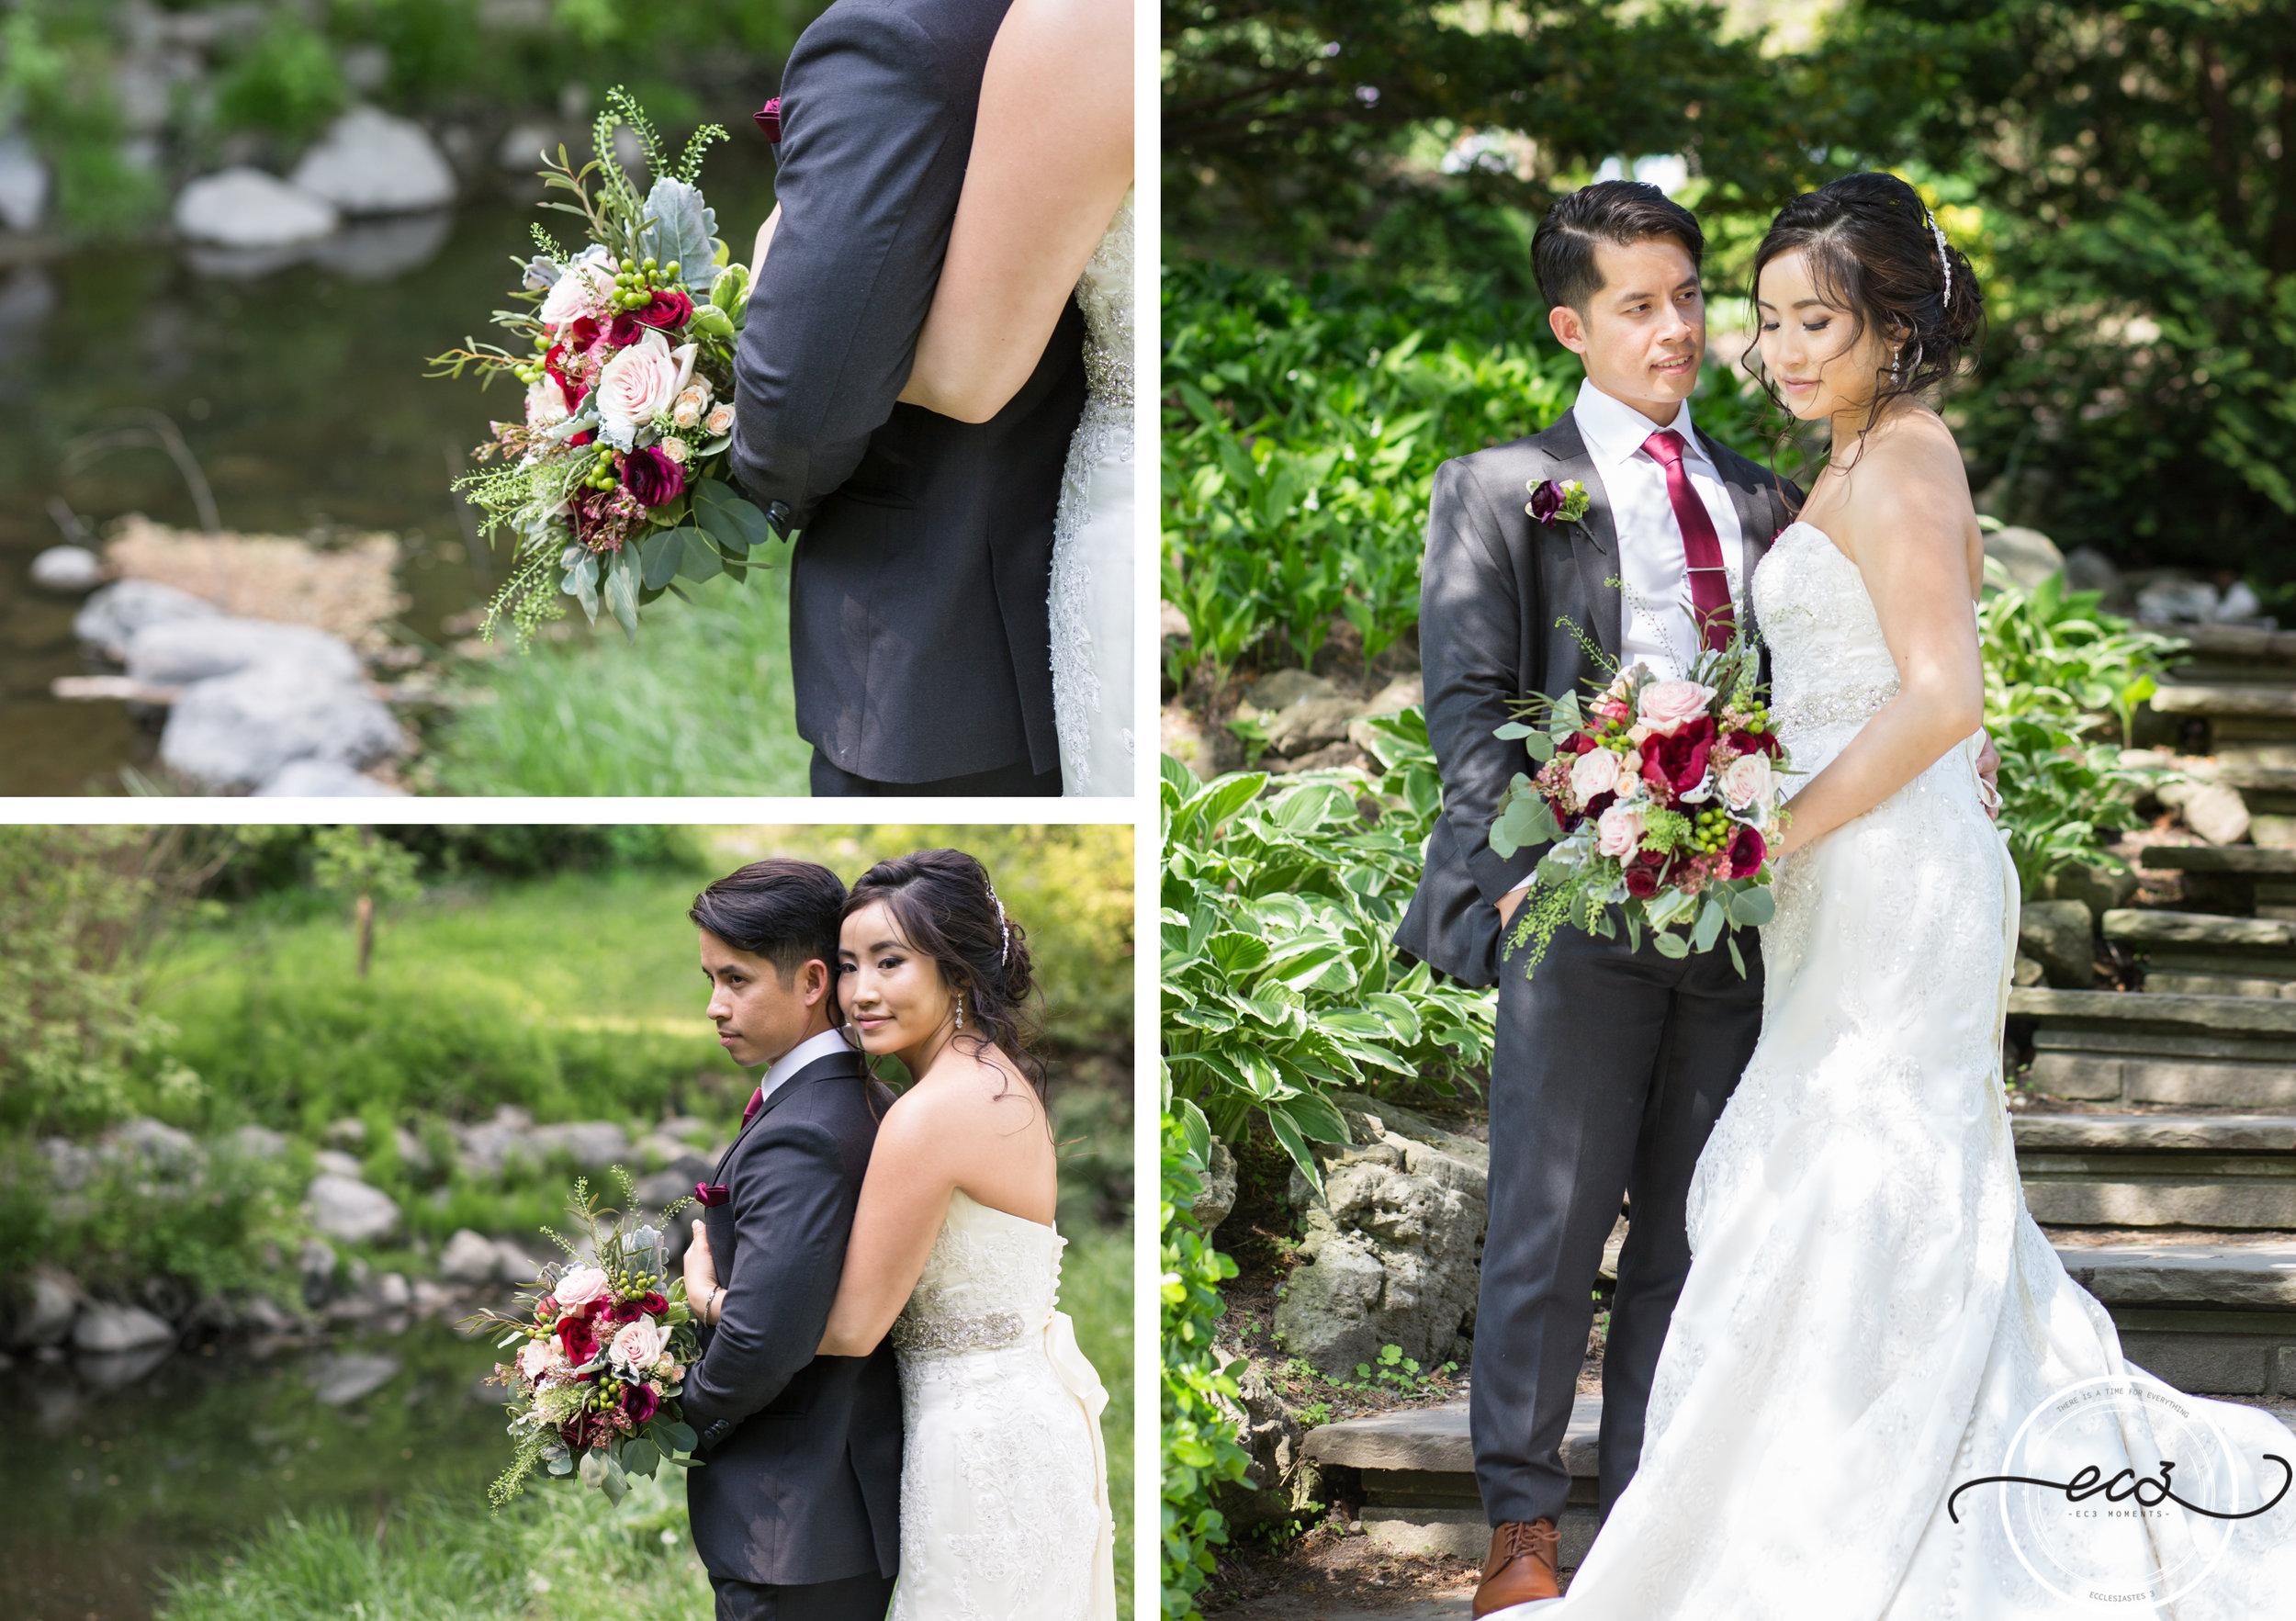 Toronto Edwards Garden and Intimate Vietnamese Wedding21.jpg